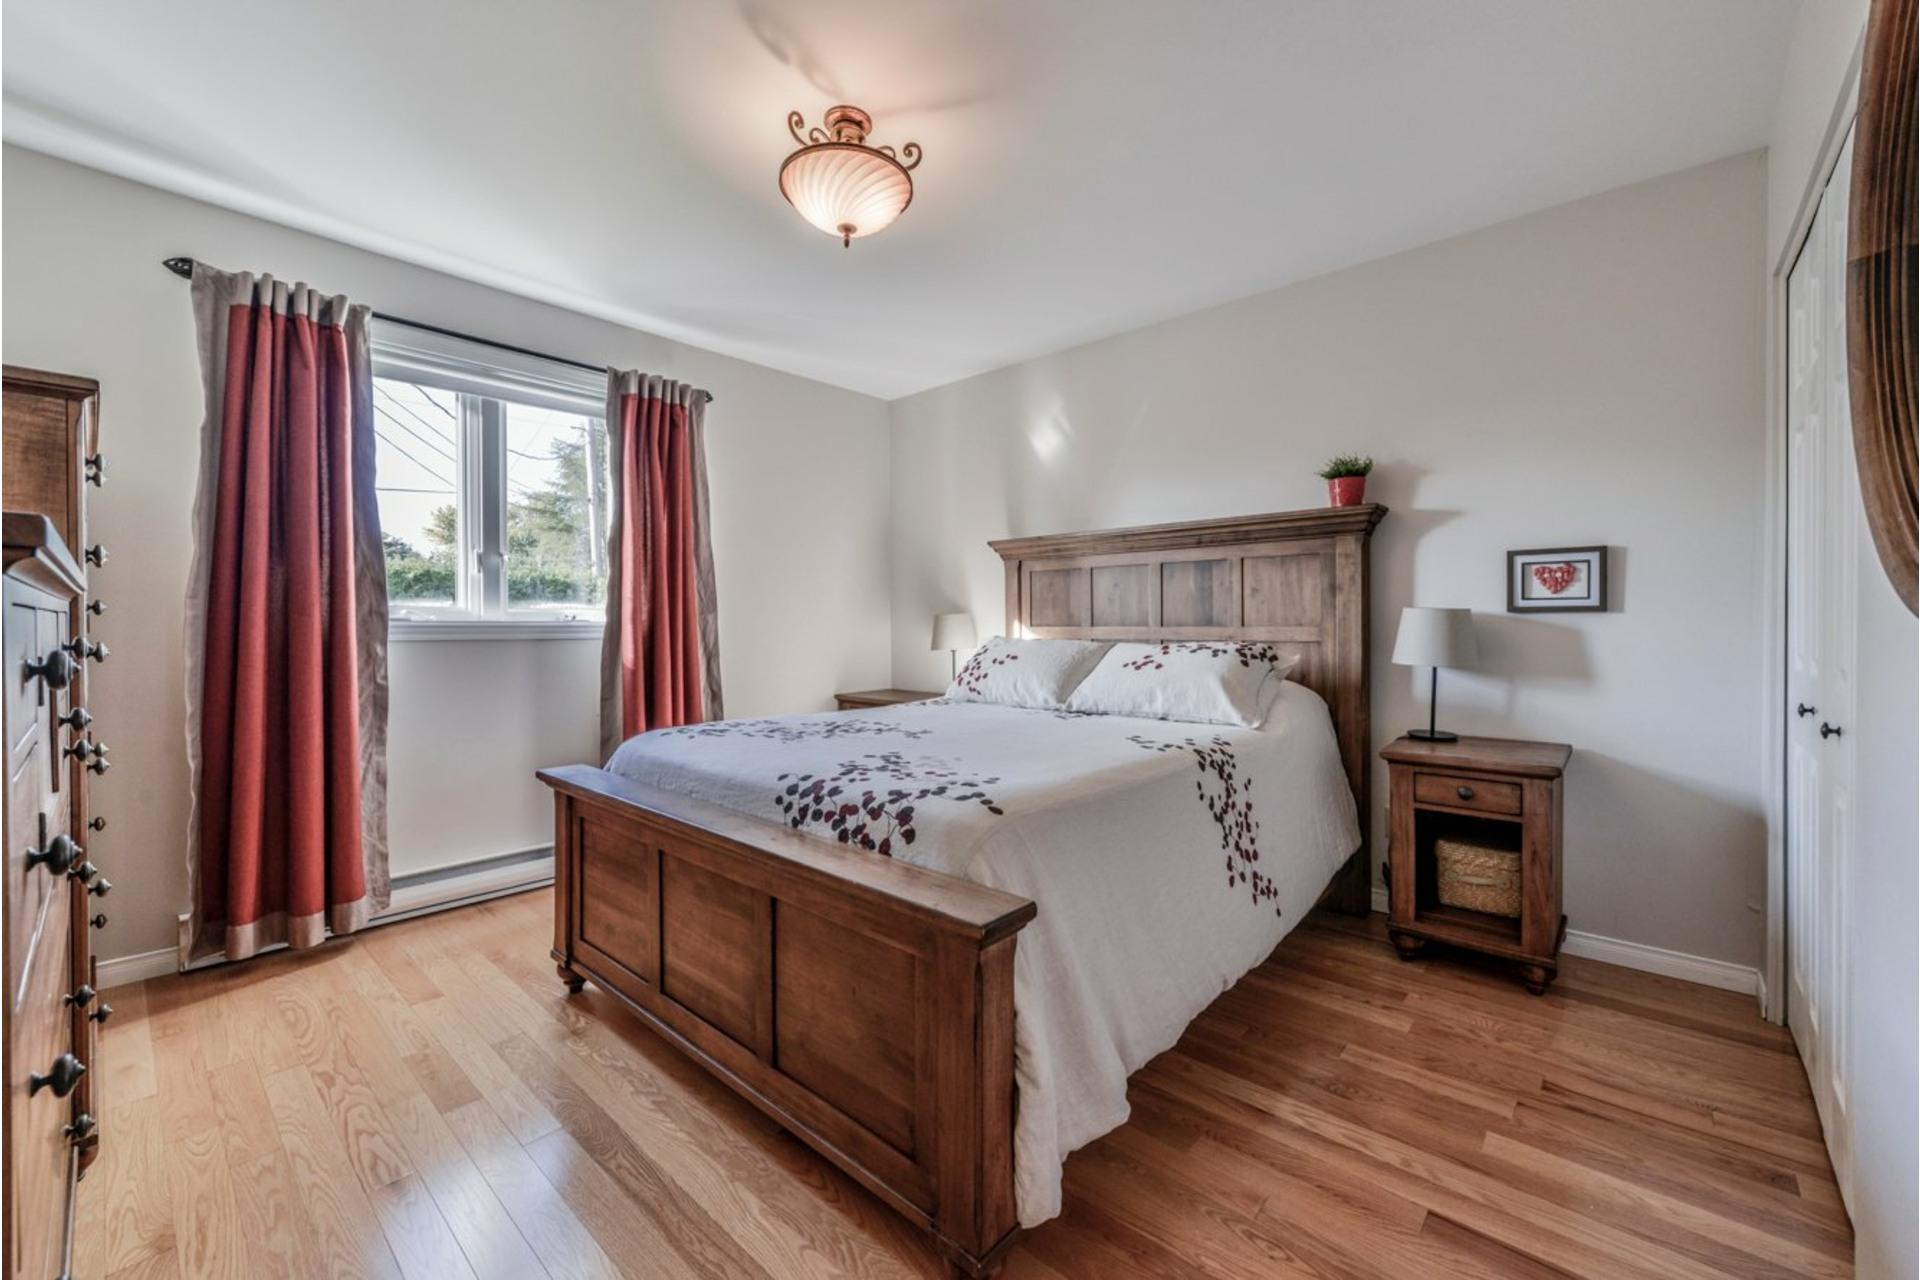 image 14 - House For sale Saint-Basile-le-Grand - 7 rooms